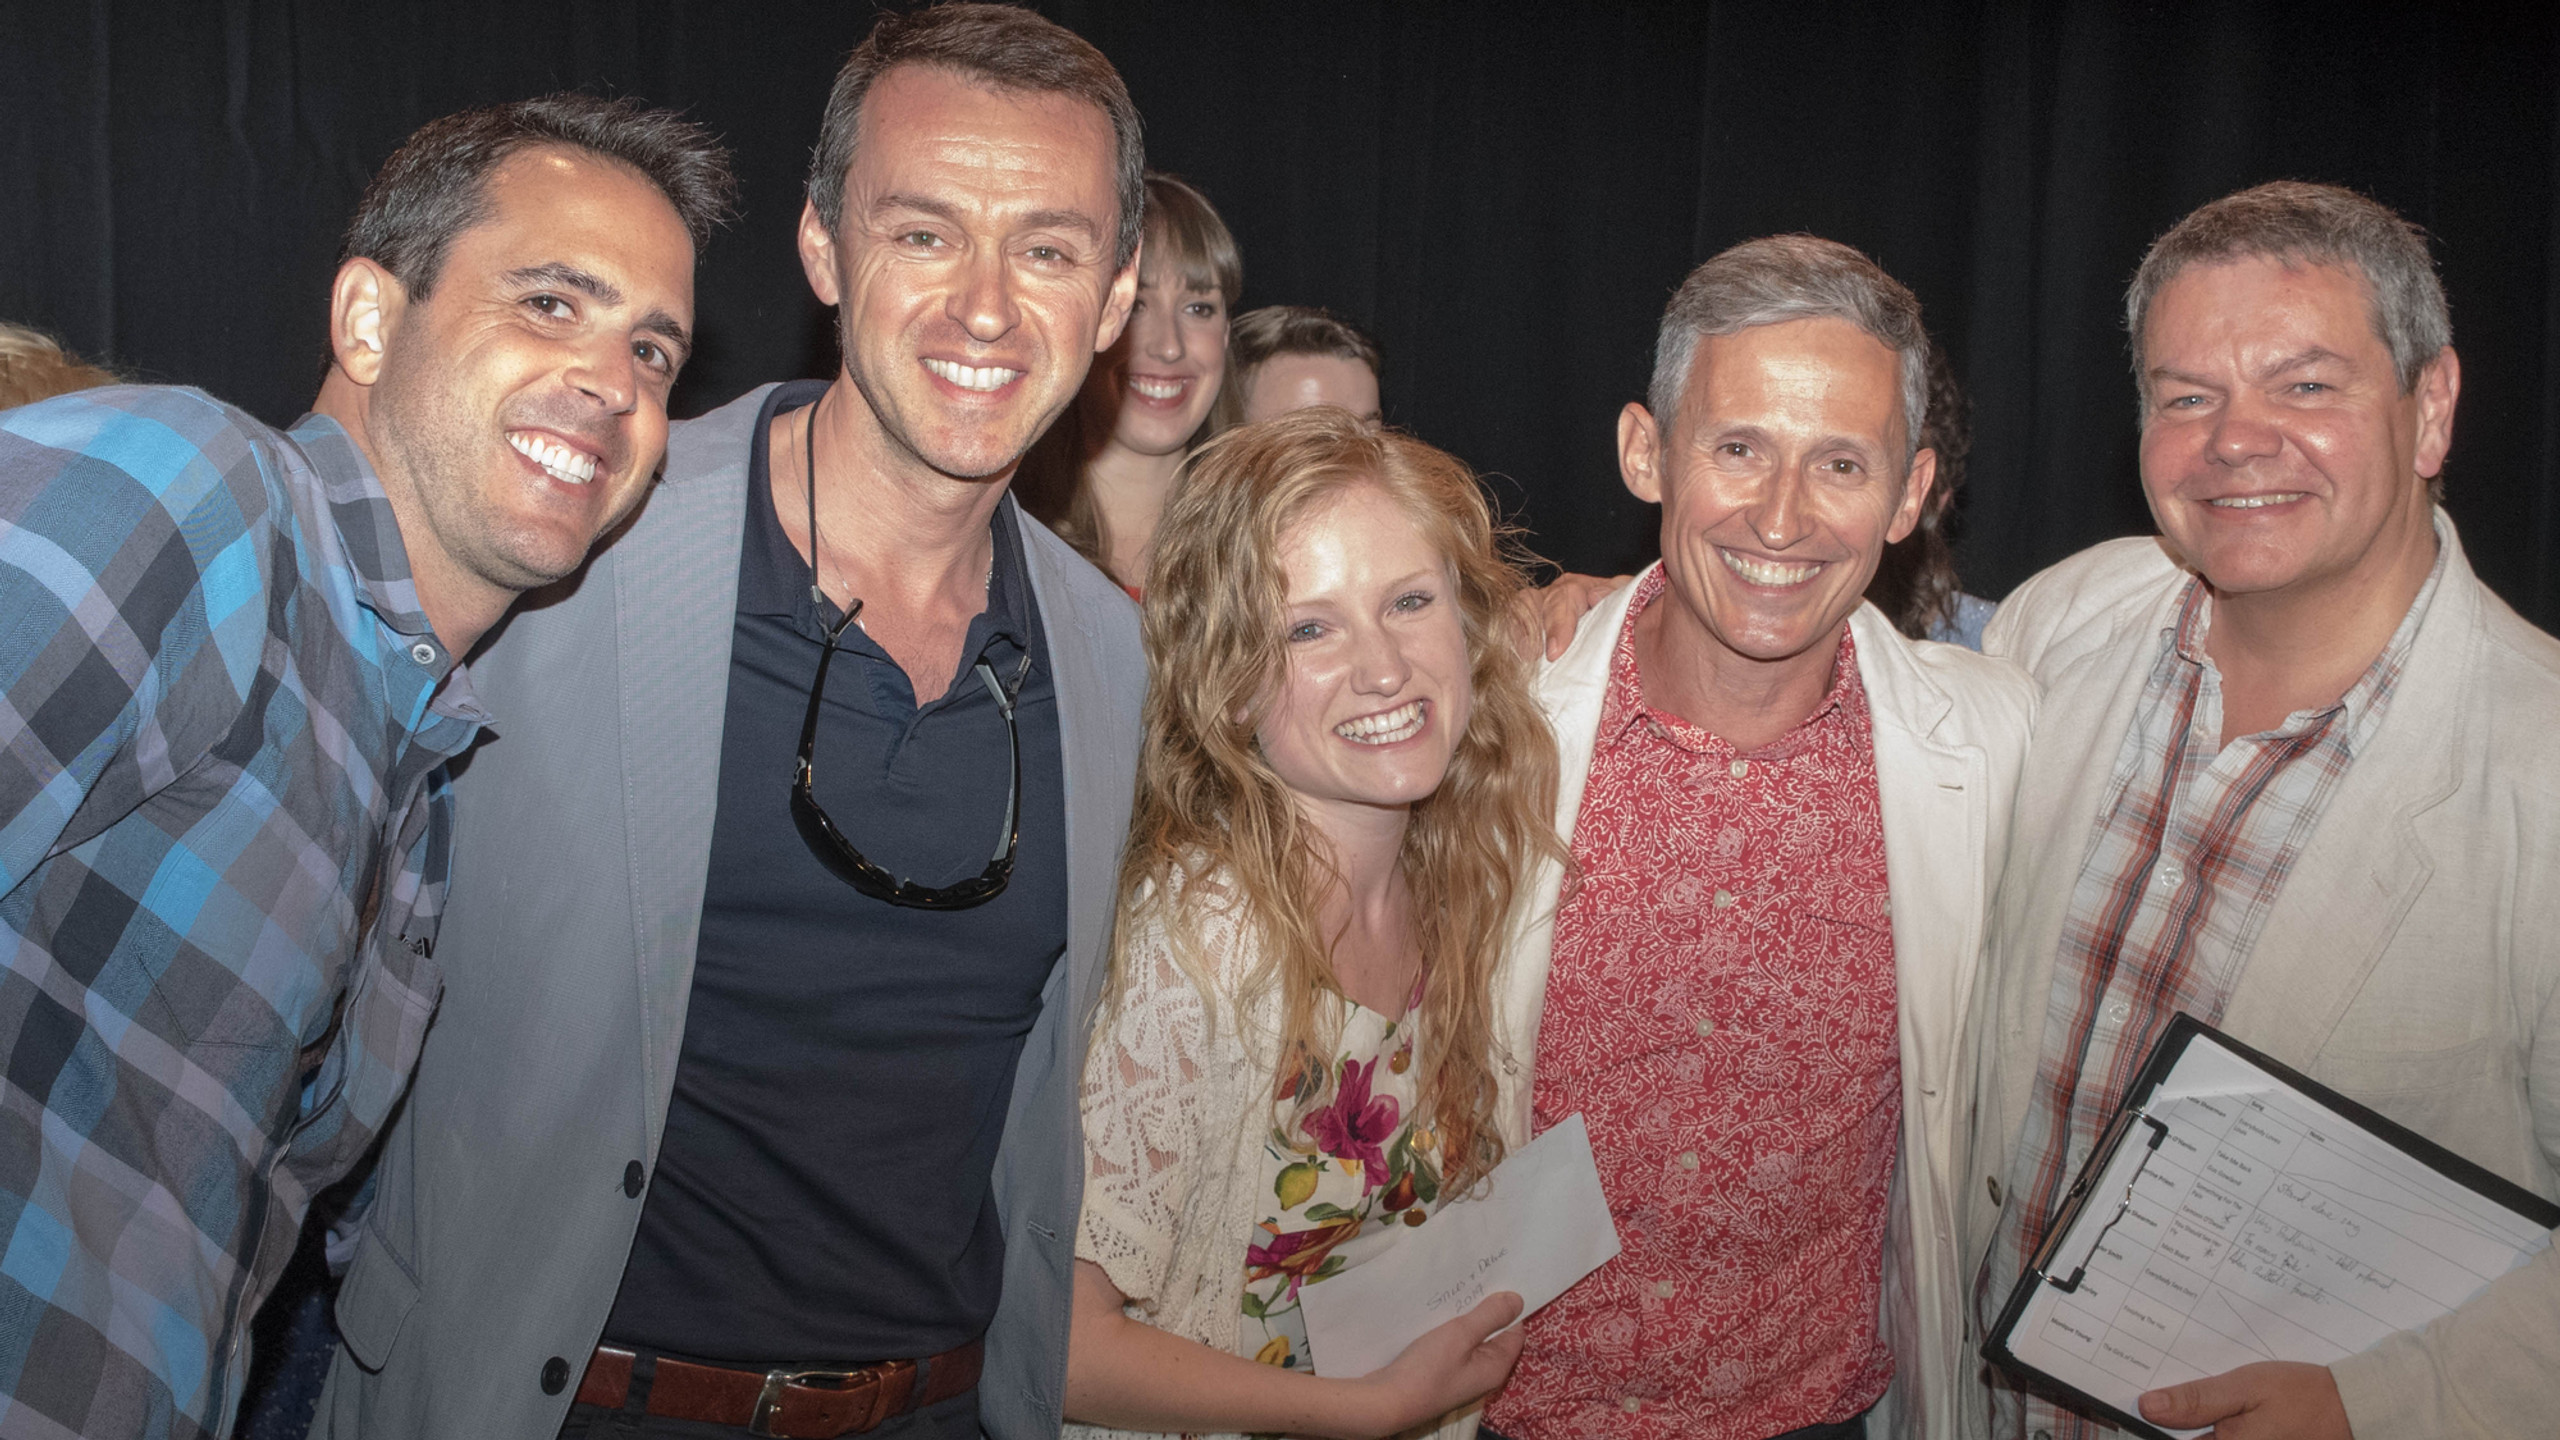 Scott Alan, Andrew Lippa, Tamar Broadben